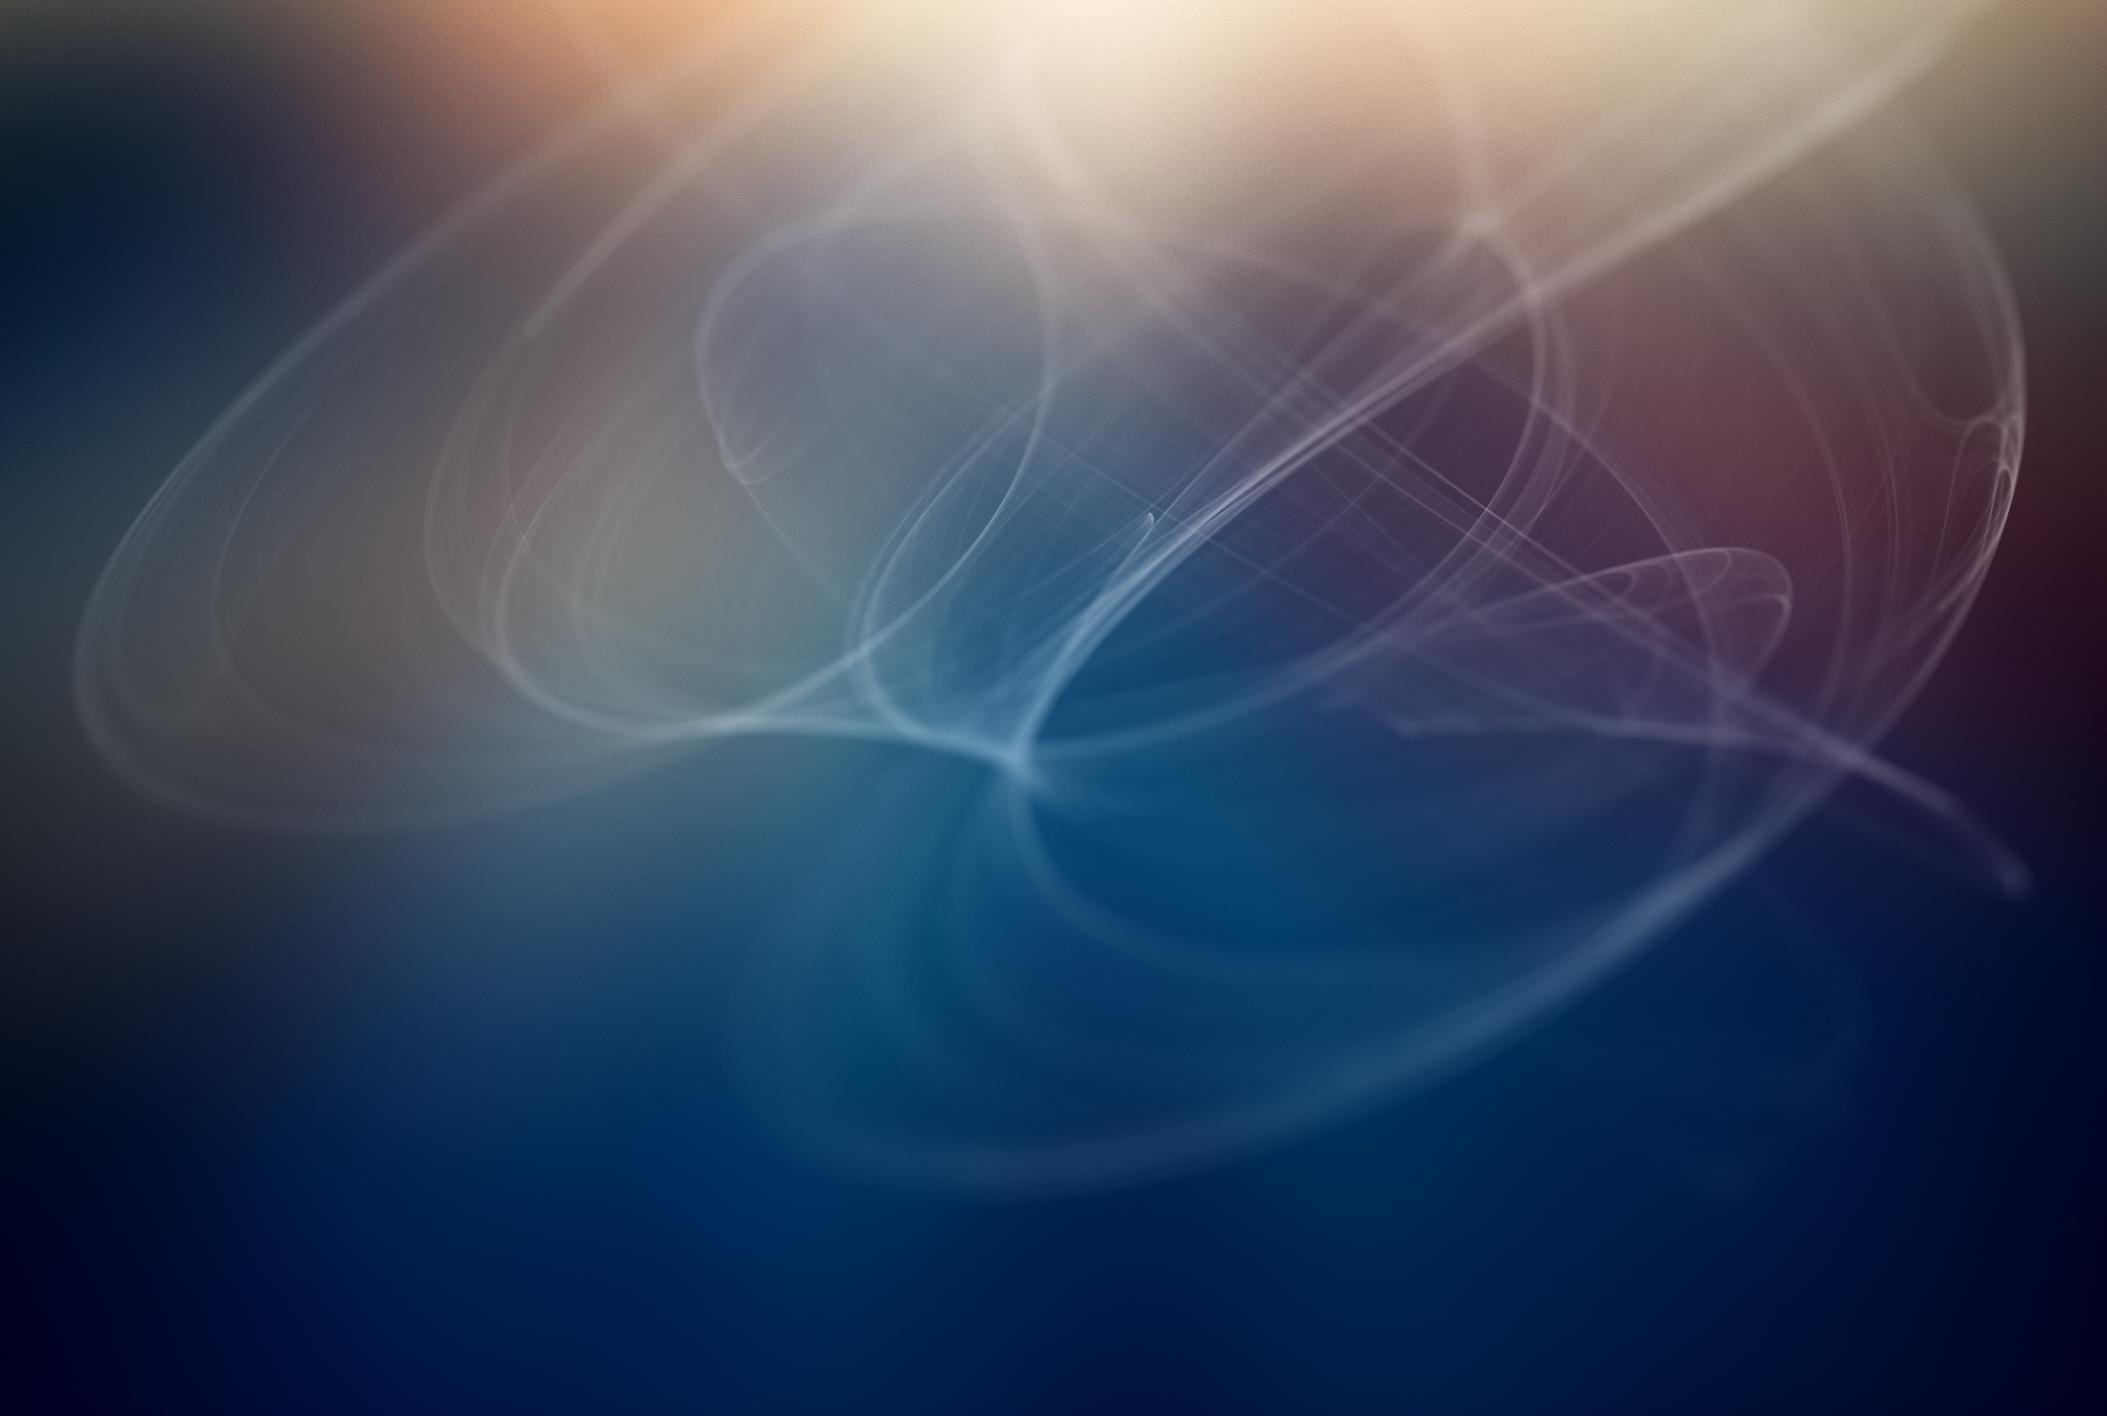 10.0/trisquel-wallpapers/data/usr/share/backgrounds/belenos3.png